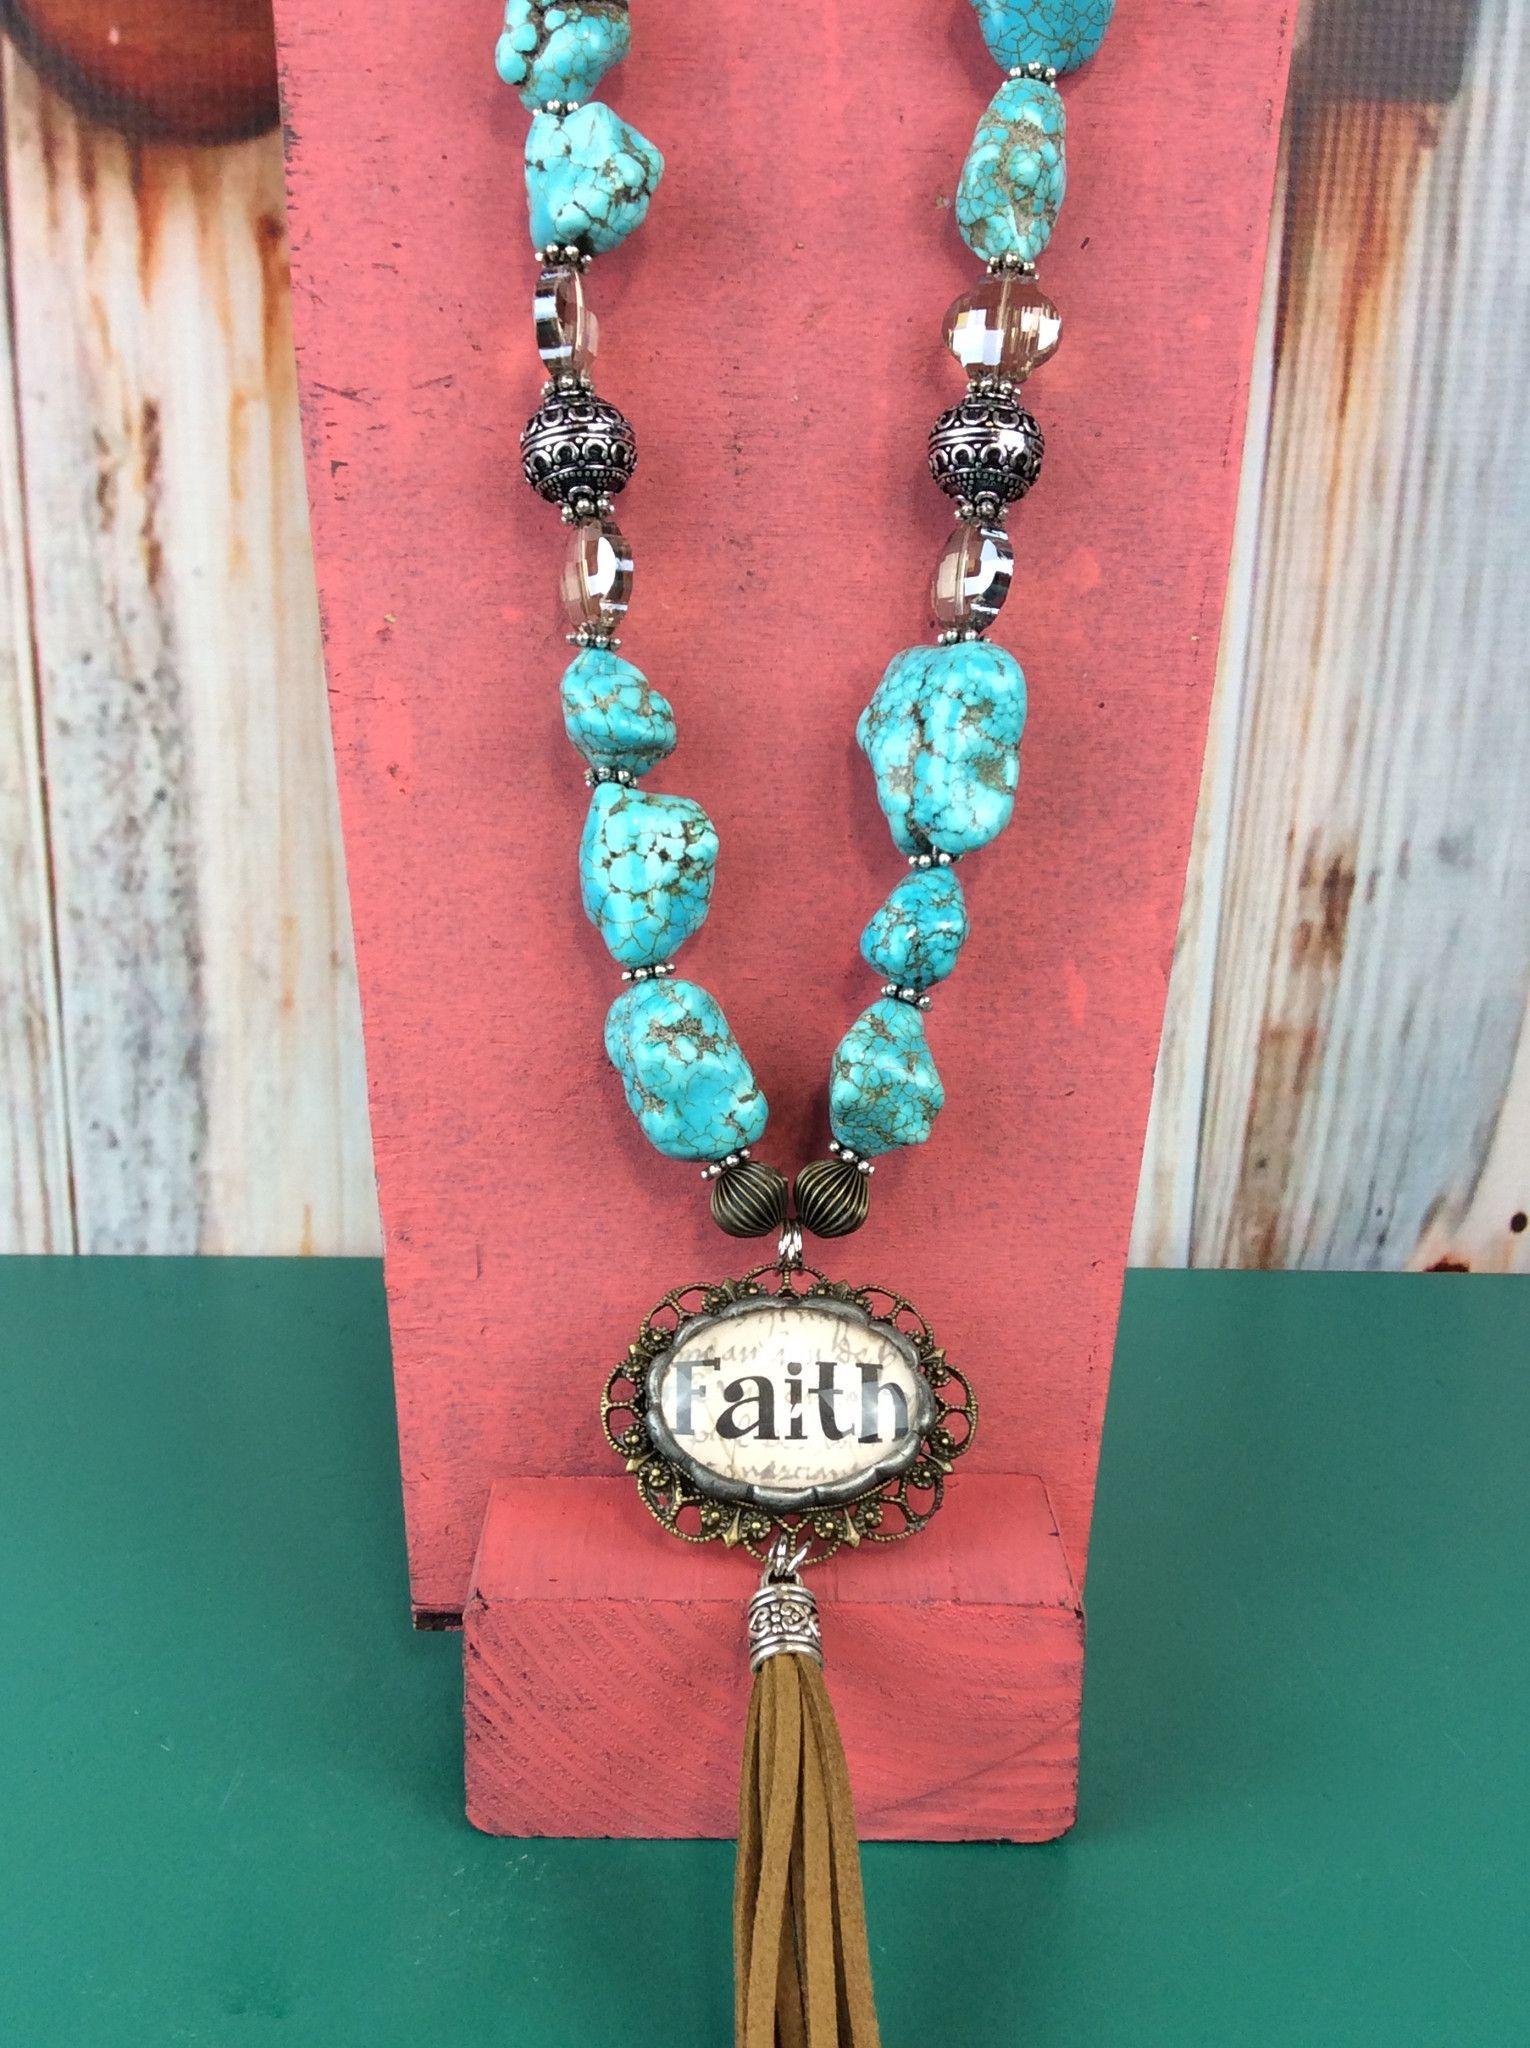 Chunky Turquoise Necklace With Tassel - Faith - NEK825TU